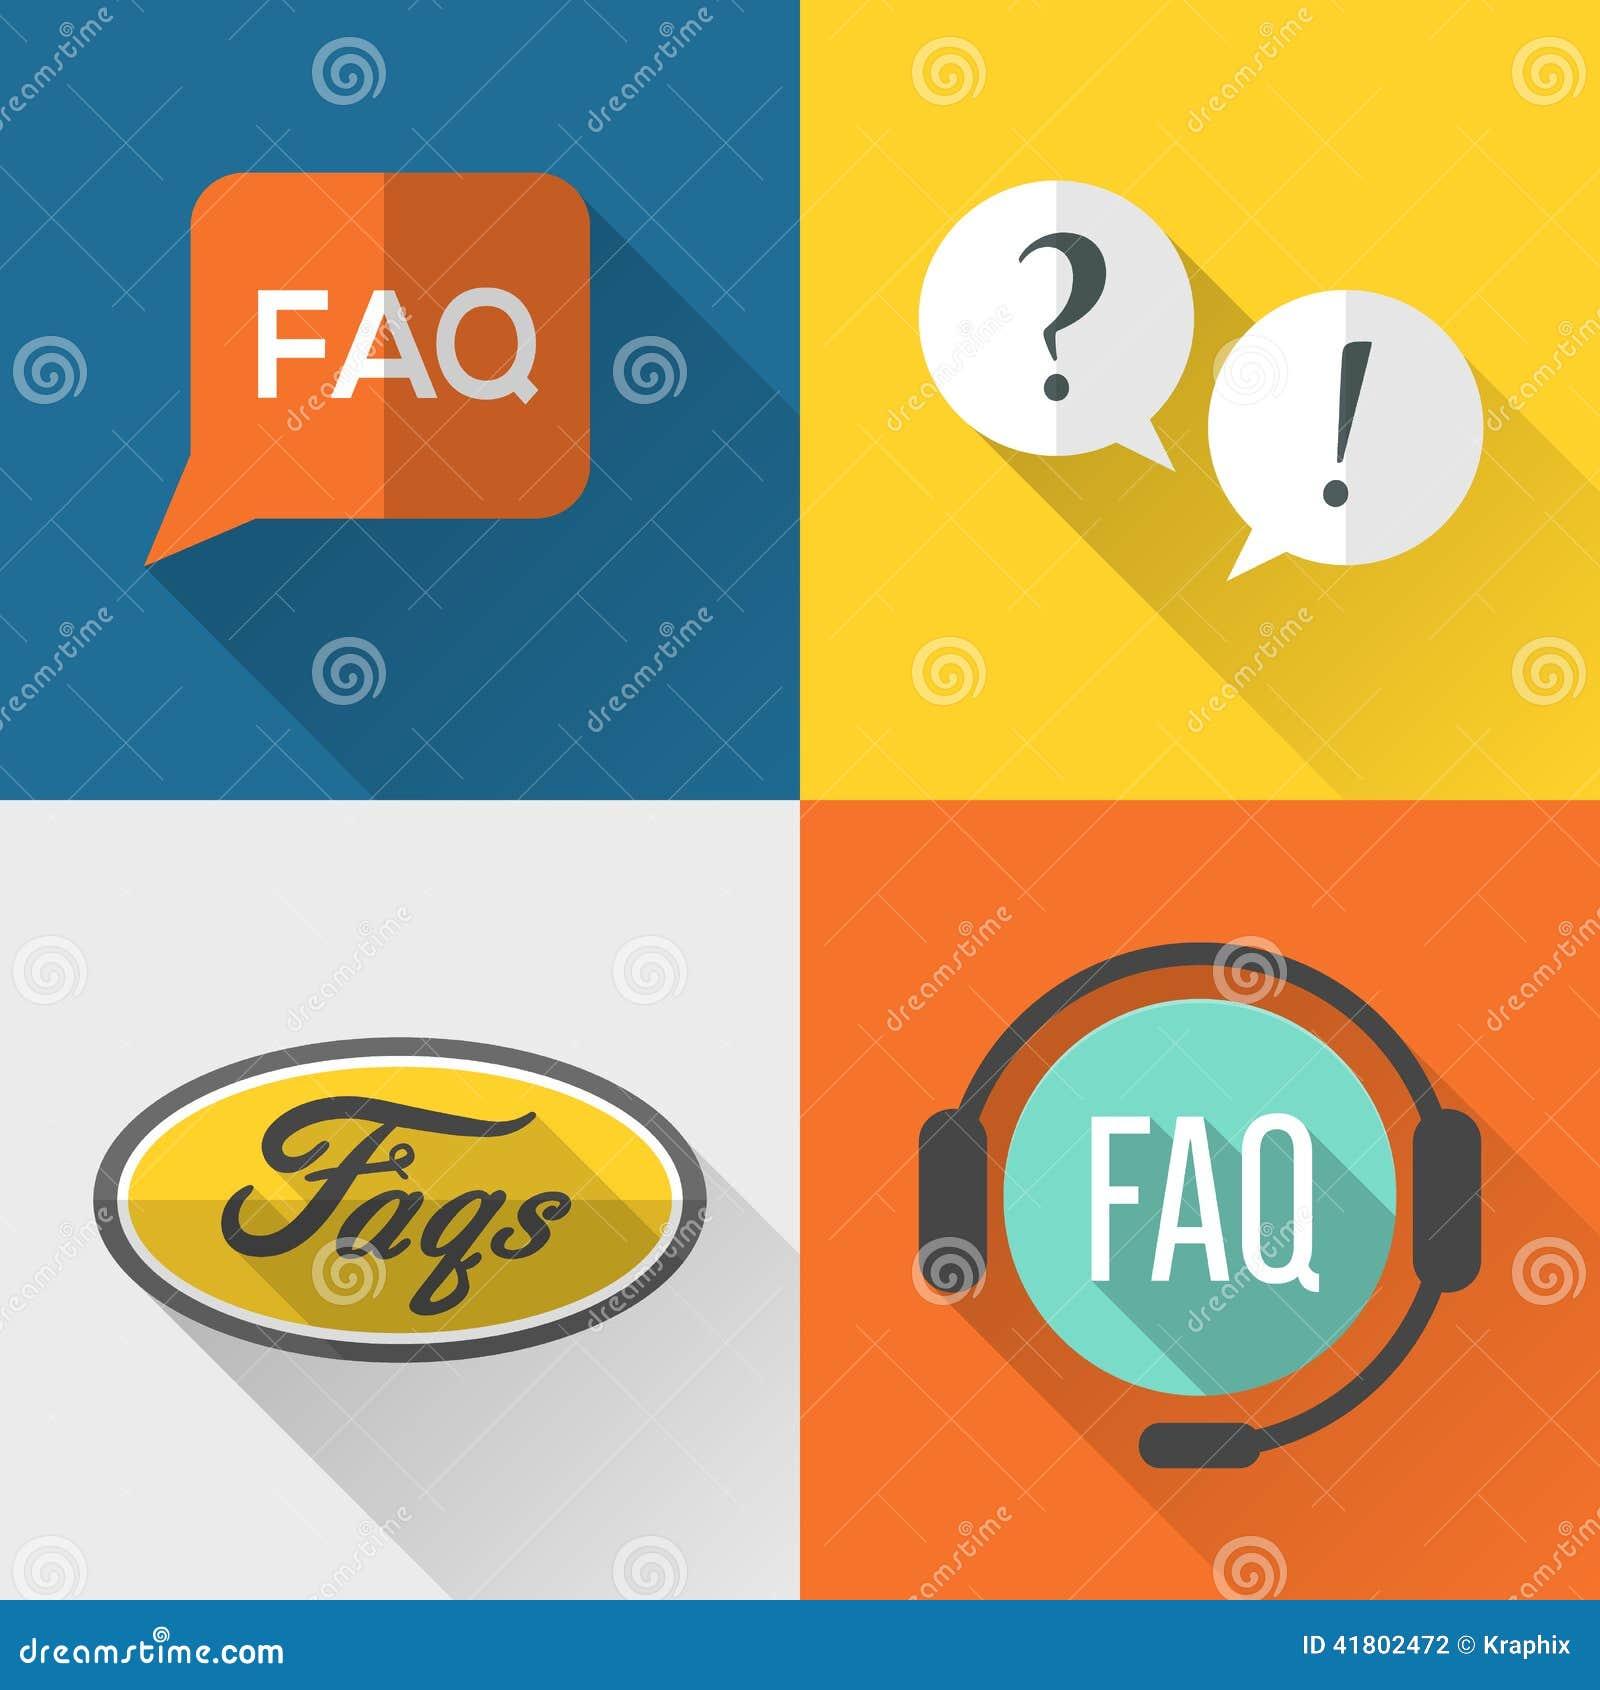 Faq: FAQs Icons Set Flat Design Stock Vector. Image Of Help